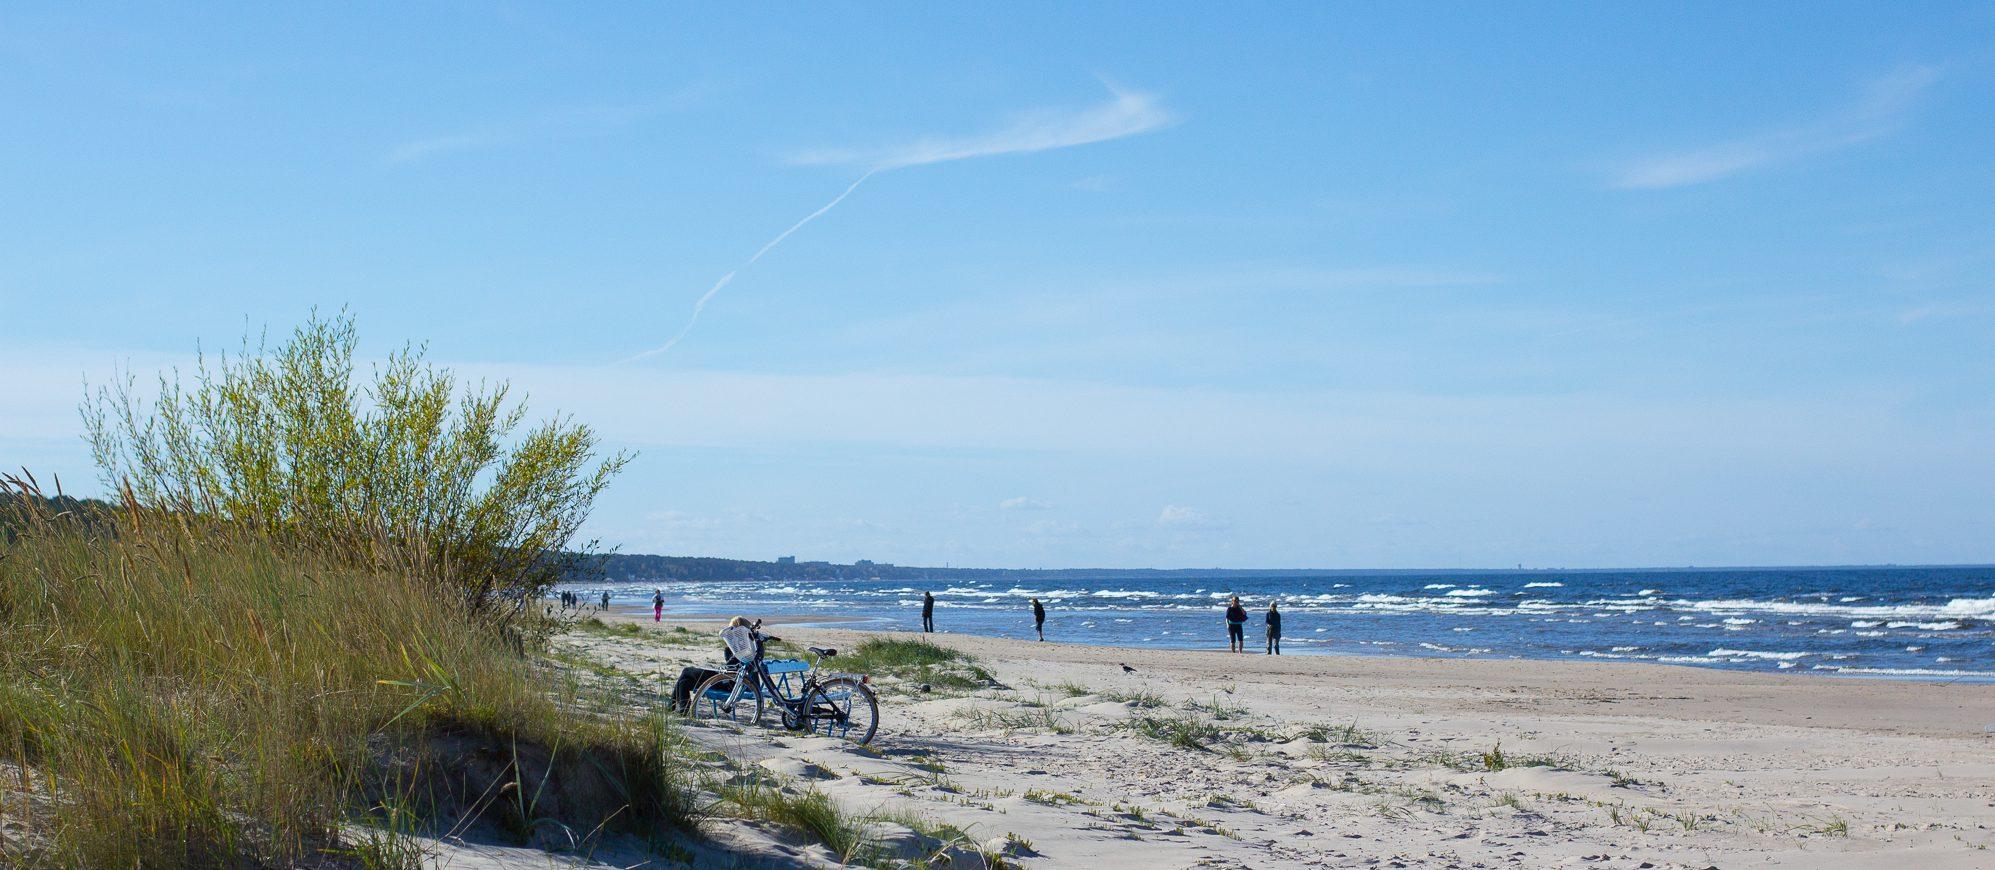 латвия, море, балтика, юрмала, путешествие